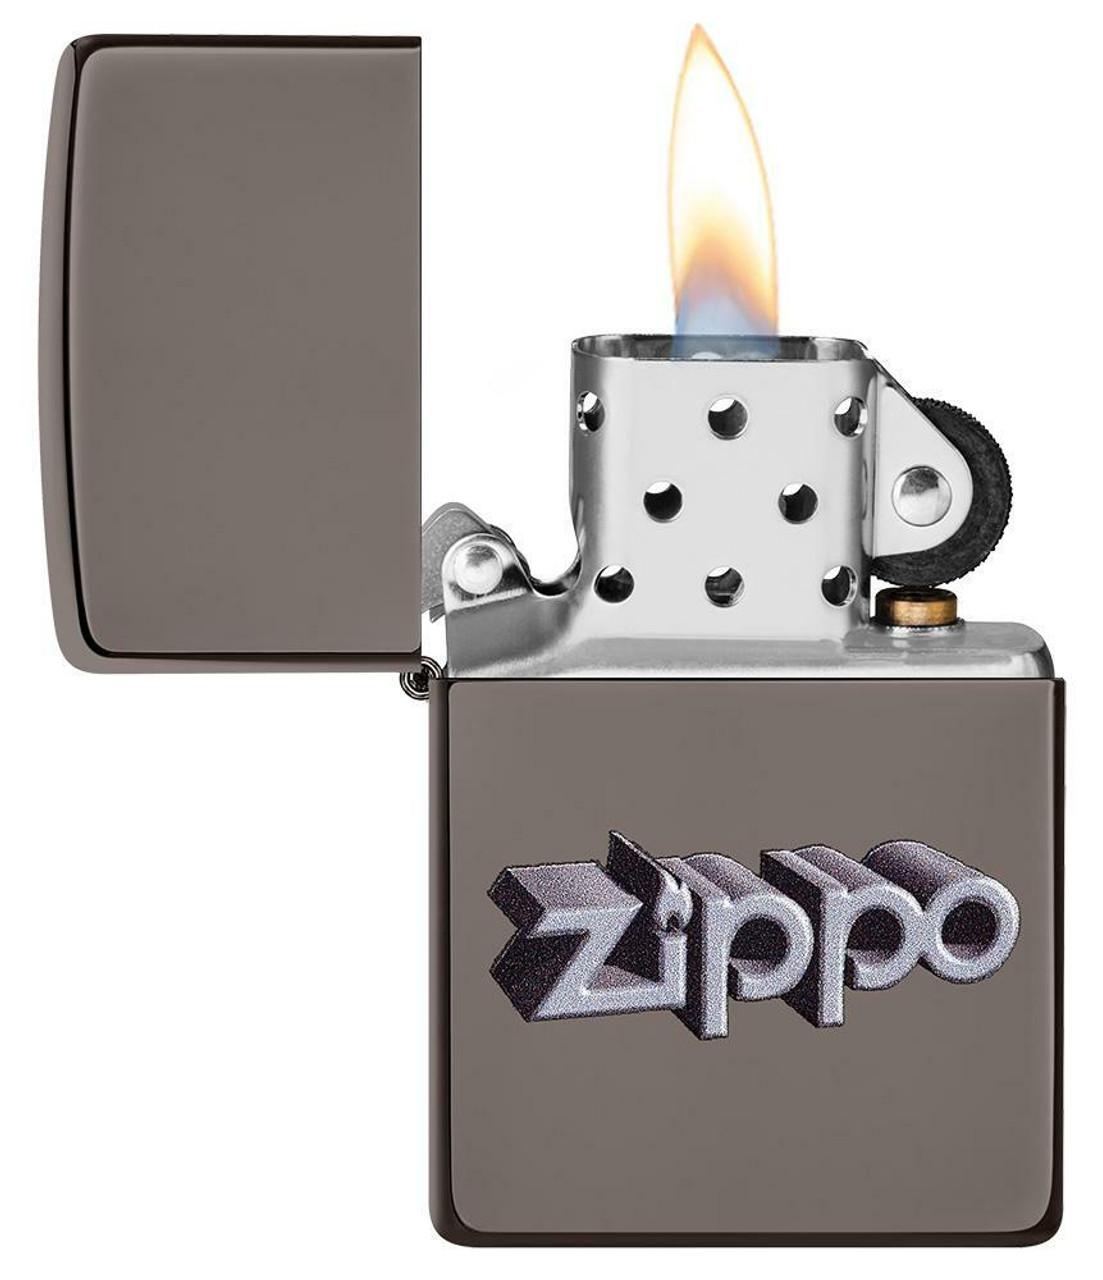 Zippo 49417-000003 Zippo Design Lighter